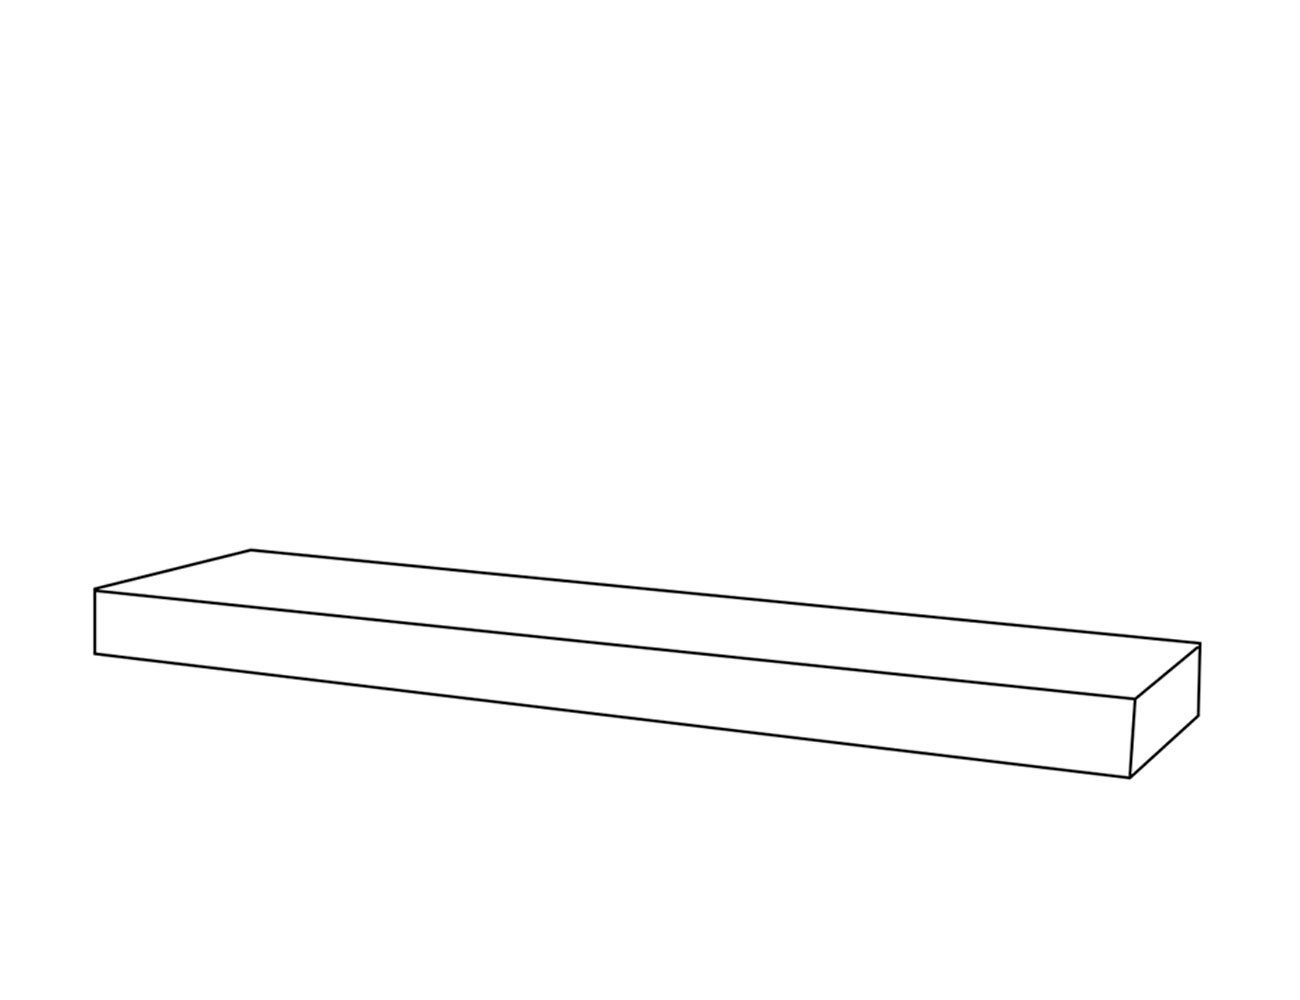 Estante con herrajes 120x8x25 cm